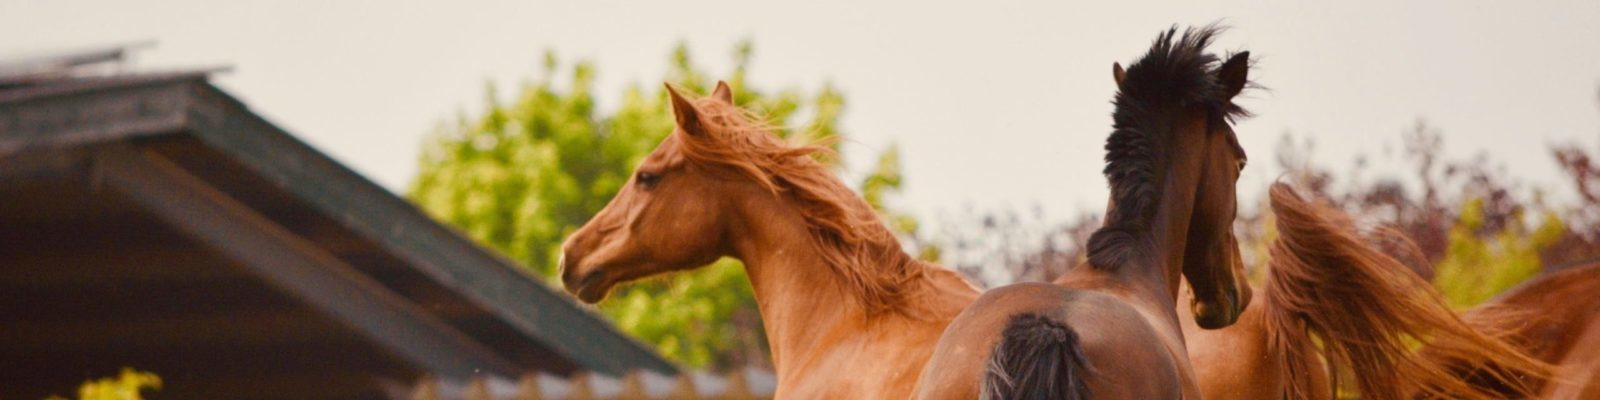 Kölner Pferde-Akademie - Aktuelles